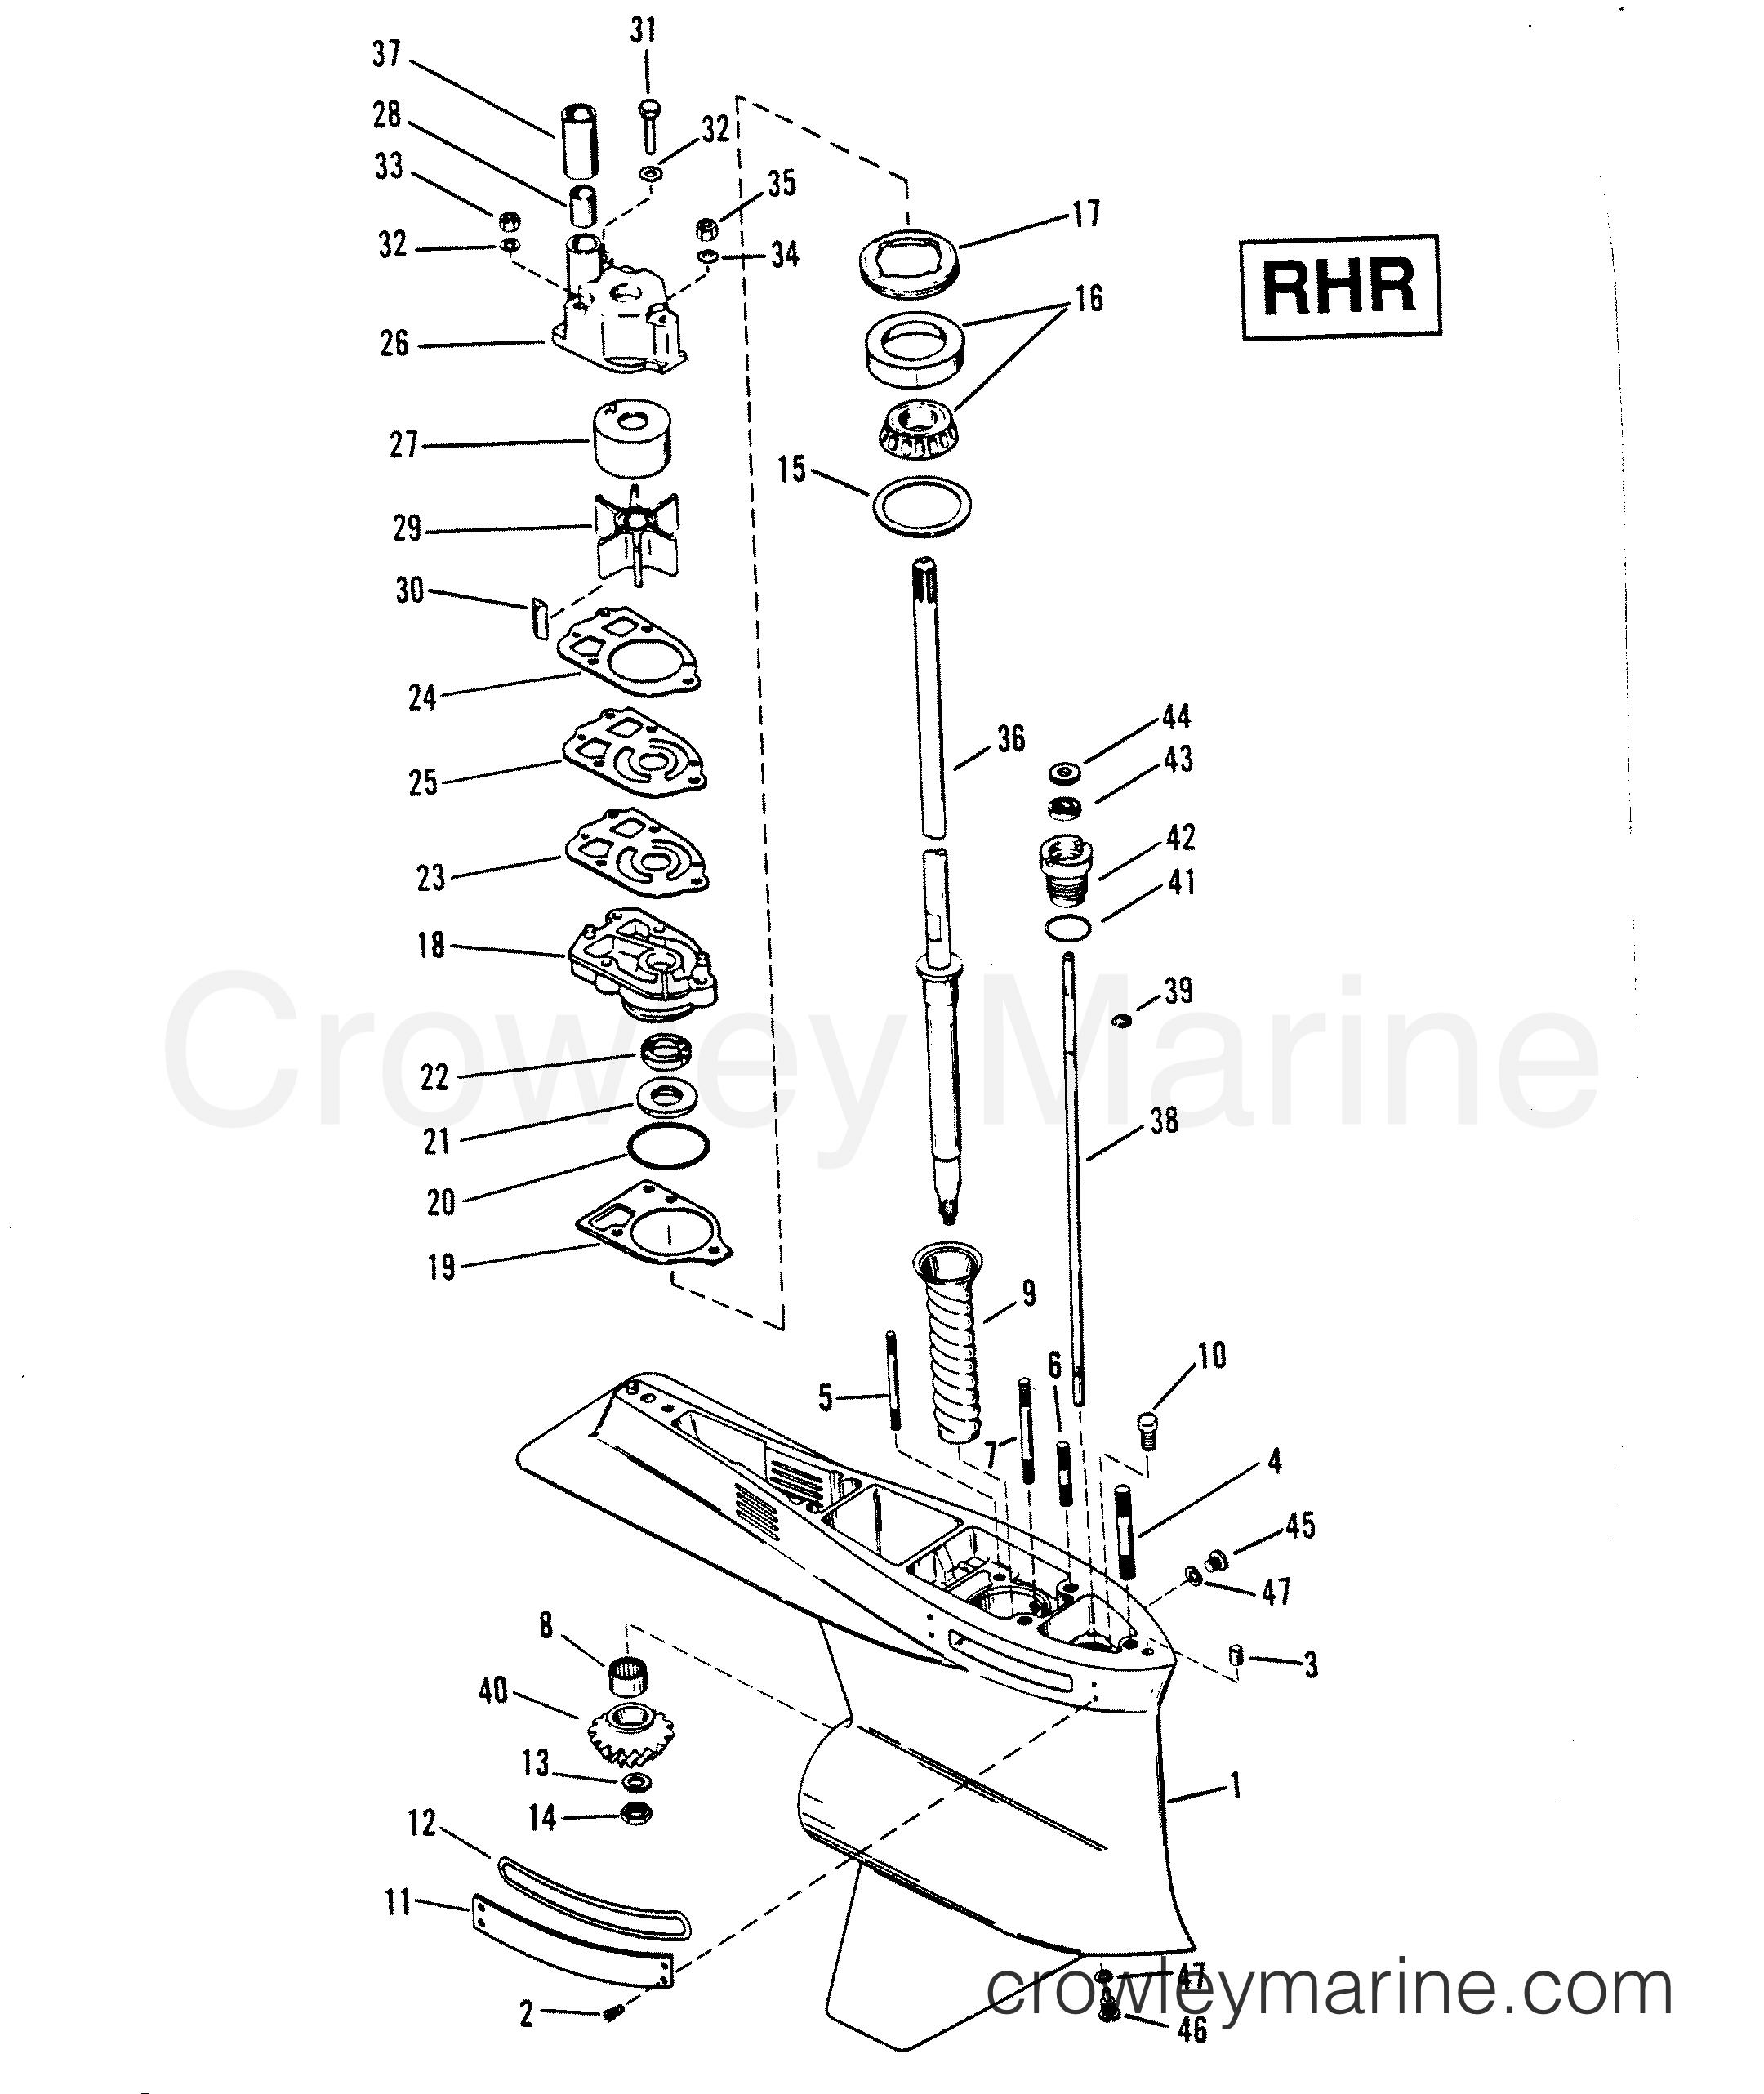 1991 Mercury Race Outboard 2.5L [L EFI] - 7925211YH - GEAR HOUSING (DRIVE SHAFT)RHR 2-HOLE WATER PICK-UP section